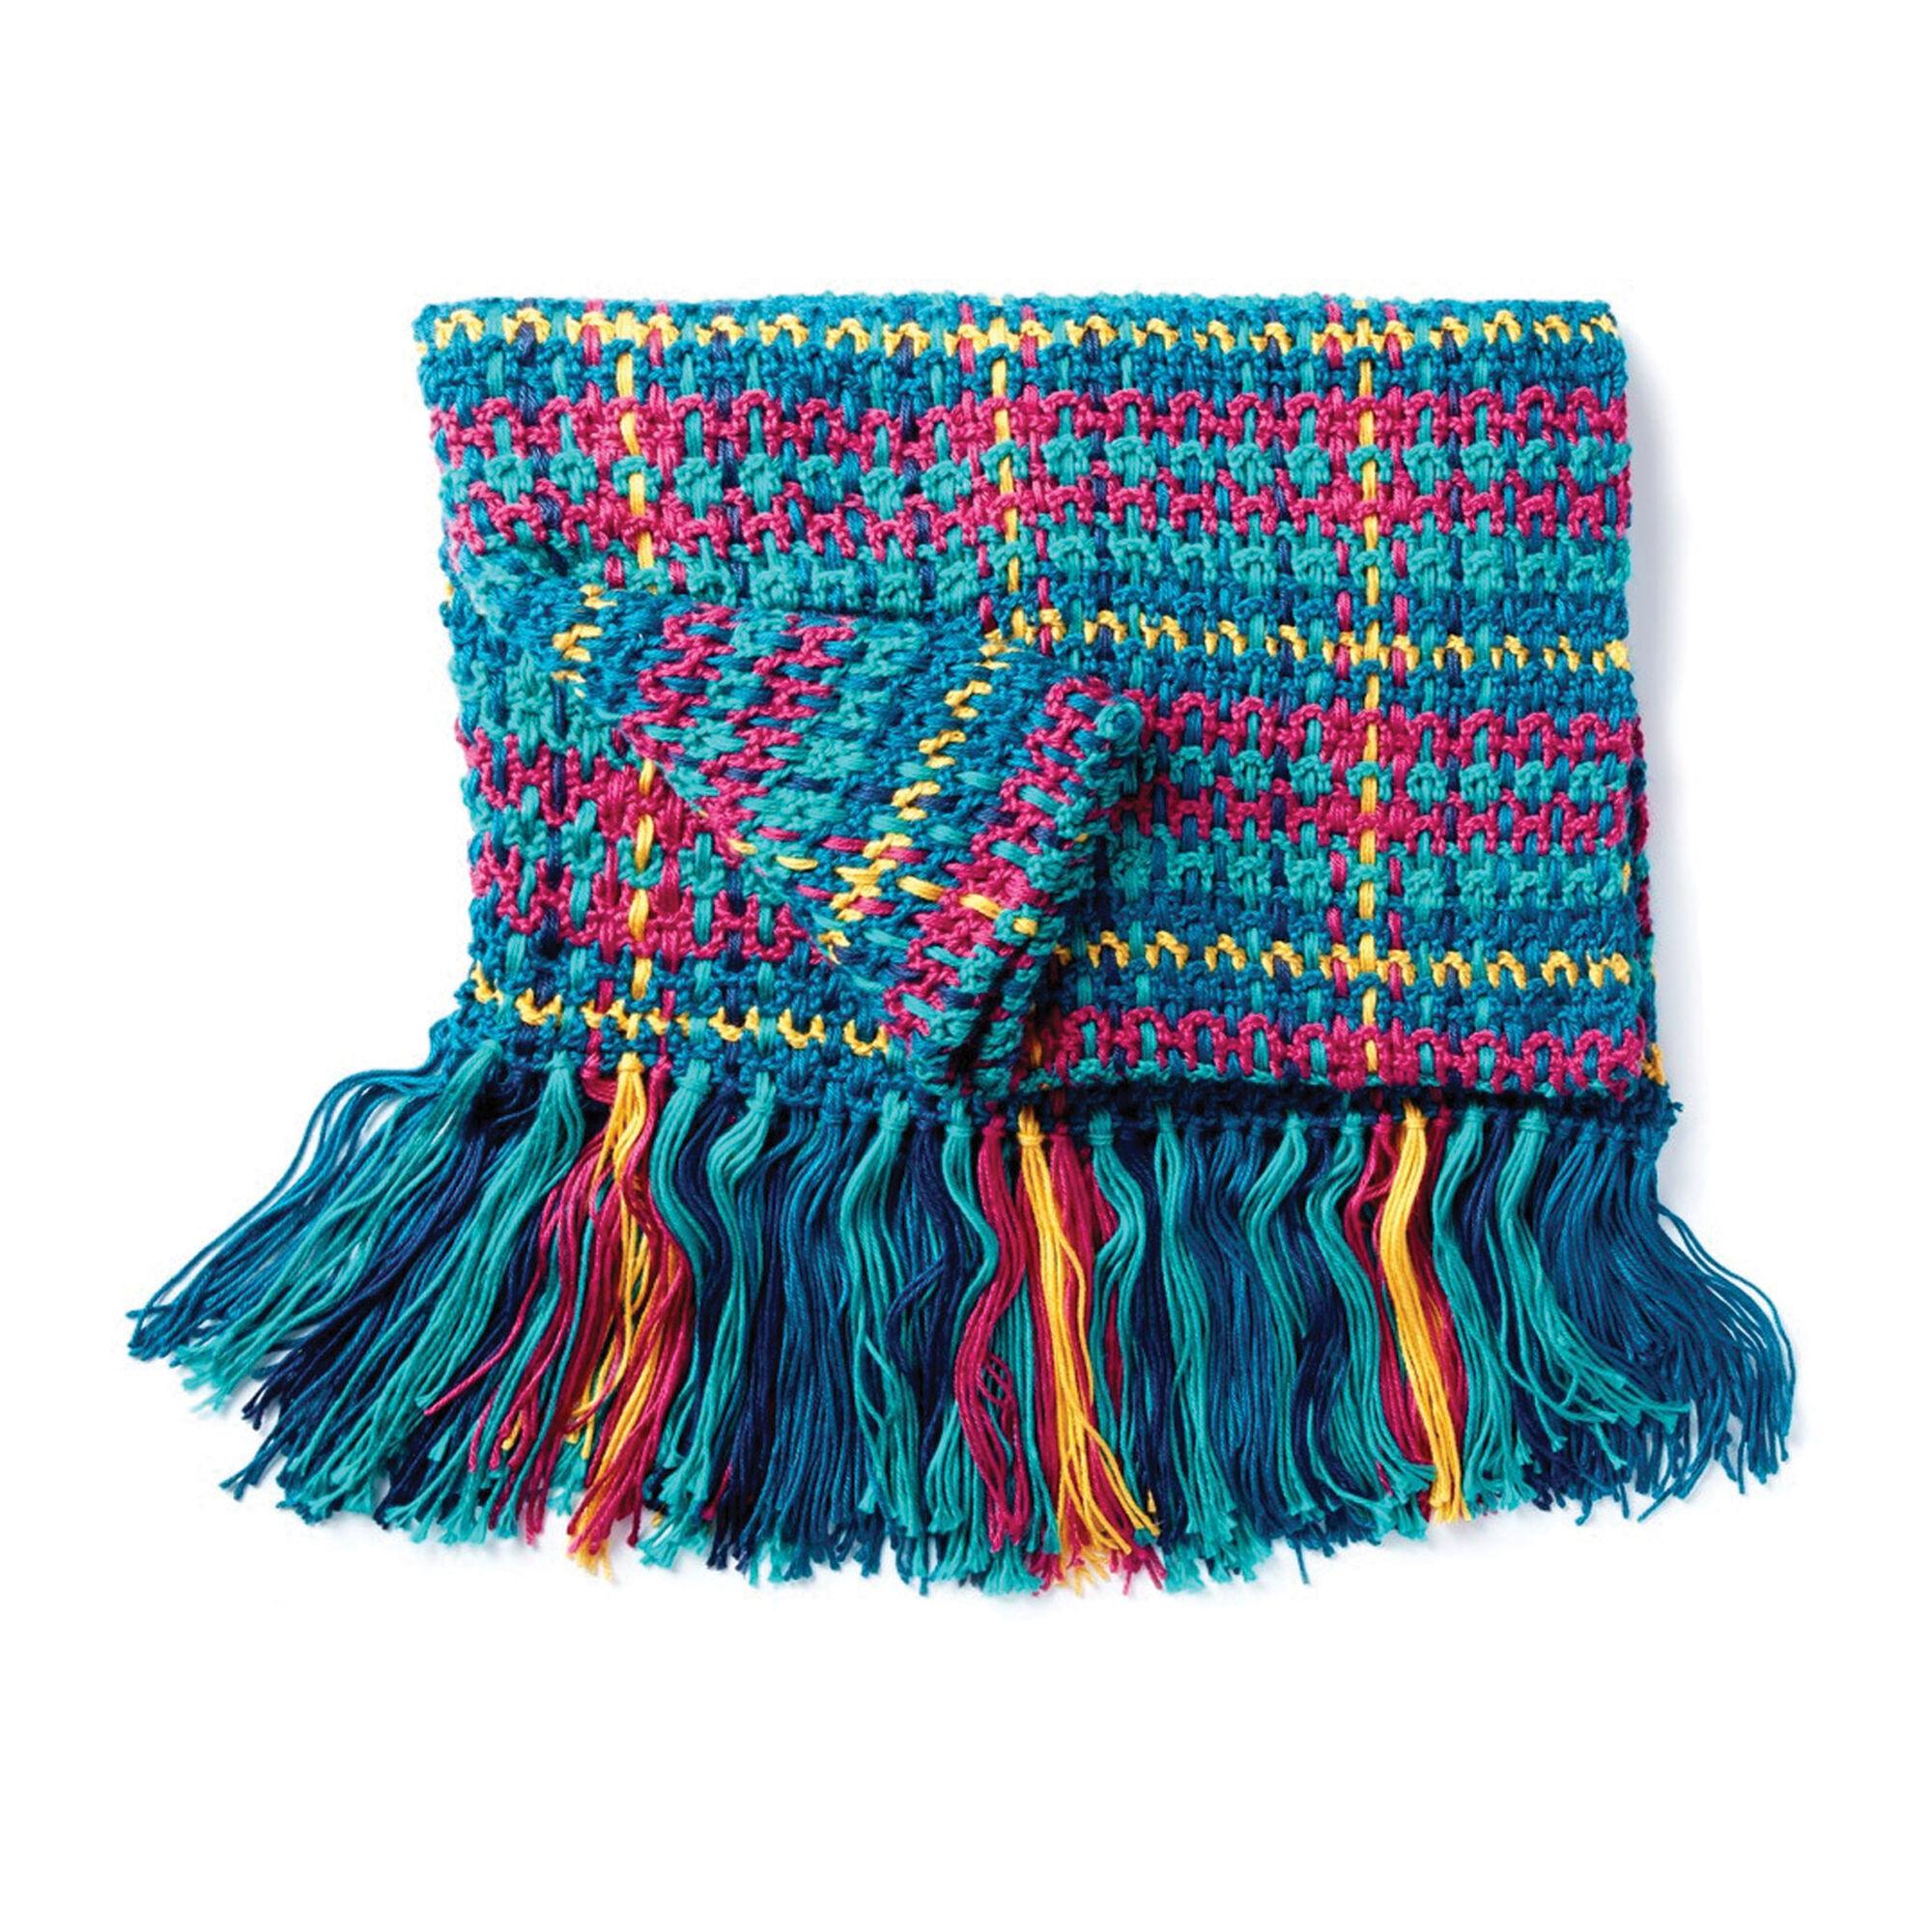 Caron Woven Plaid Crochet Blanket, Bright Pattern | Yarnspirations